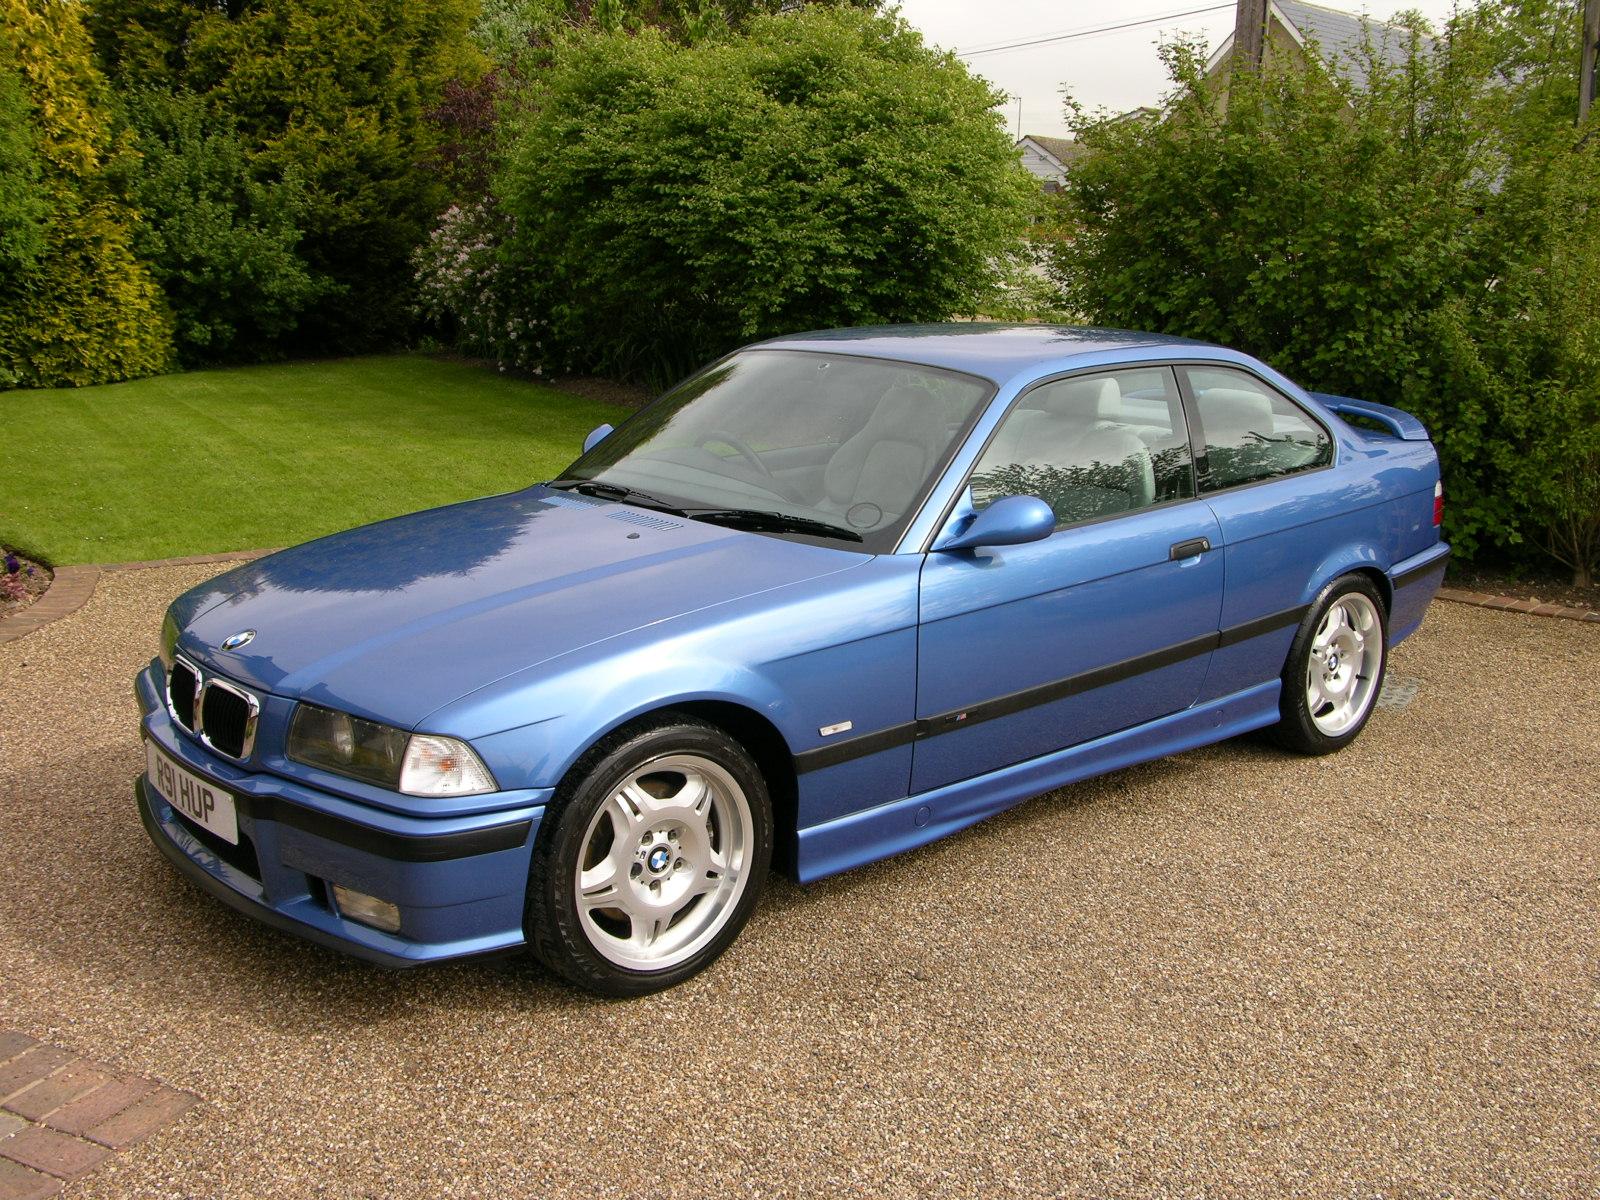 BMW E36 M3 Photo